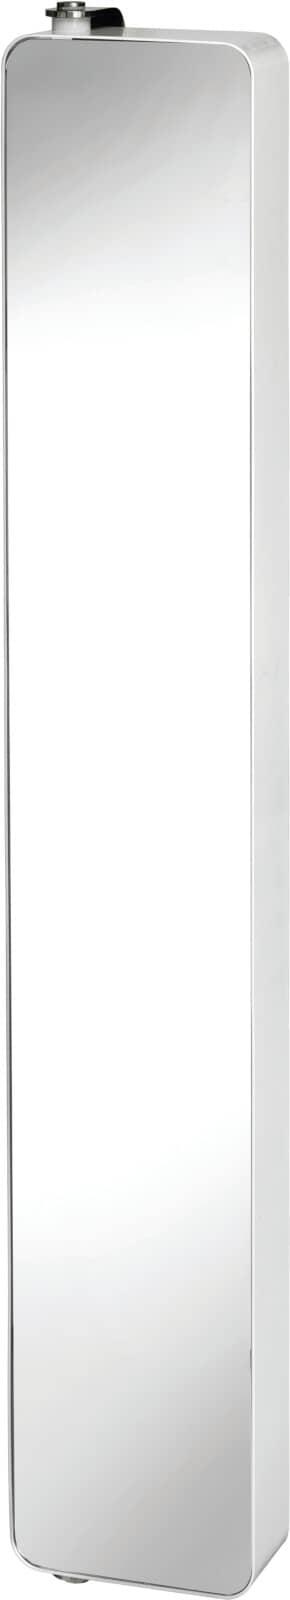 Croydex Arun Tall Bathroom Cabinet with Pivoting Door